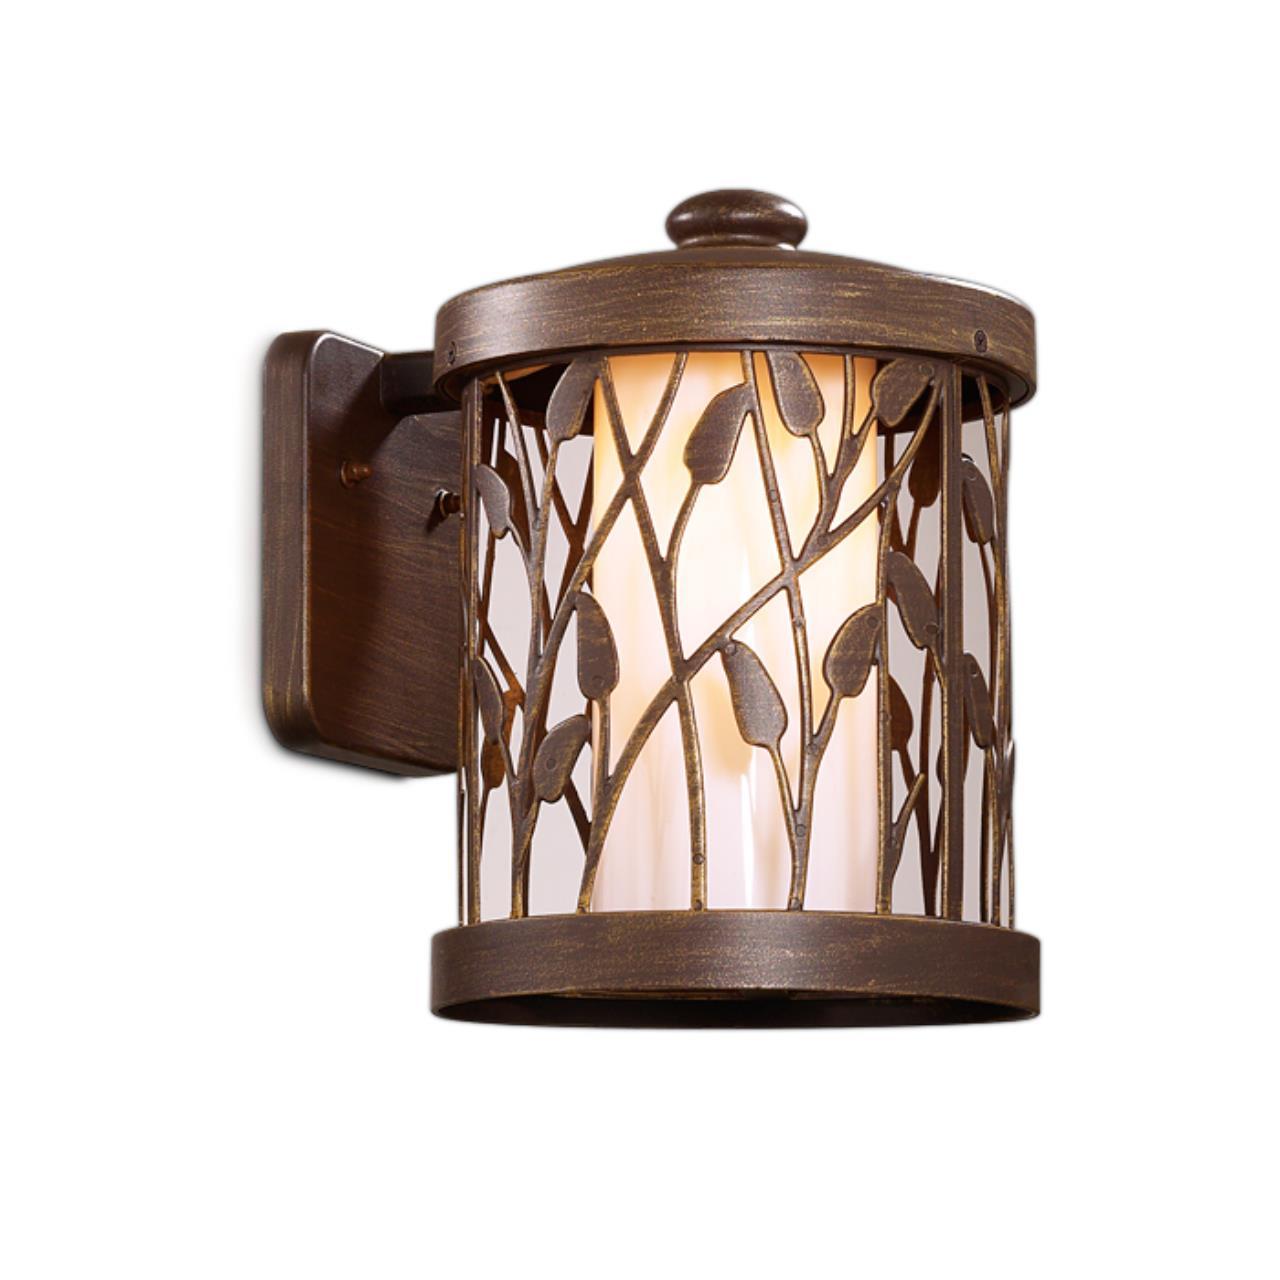 2287/1W NATURE ODL12 715 патина коричневый Уличный настен светильник IP44 E27 100W 220V LAGRA